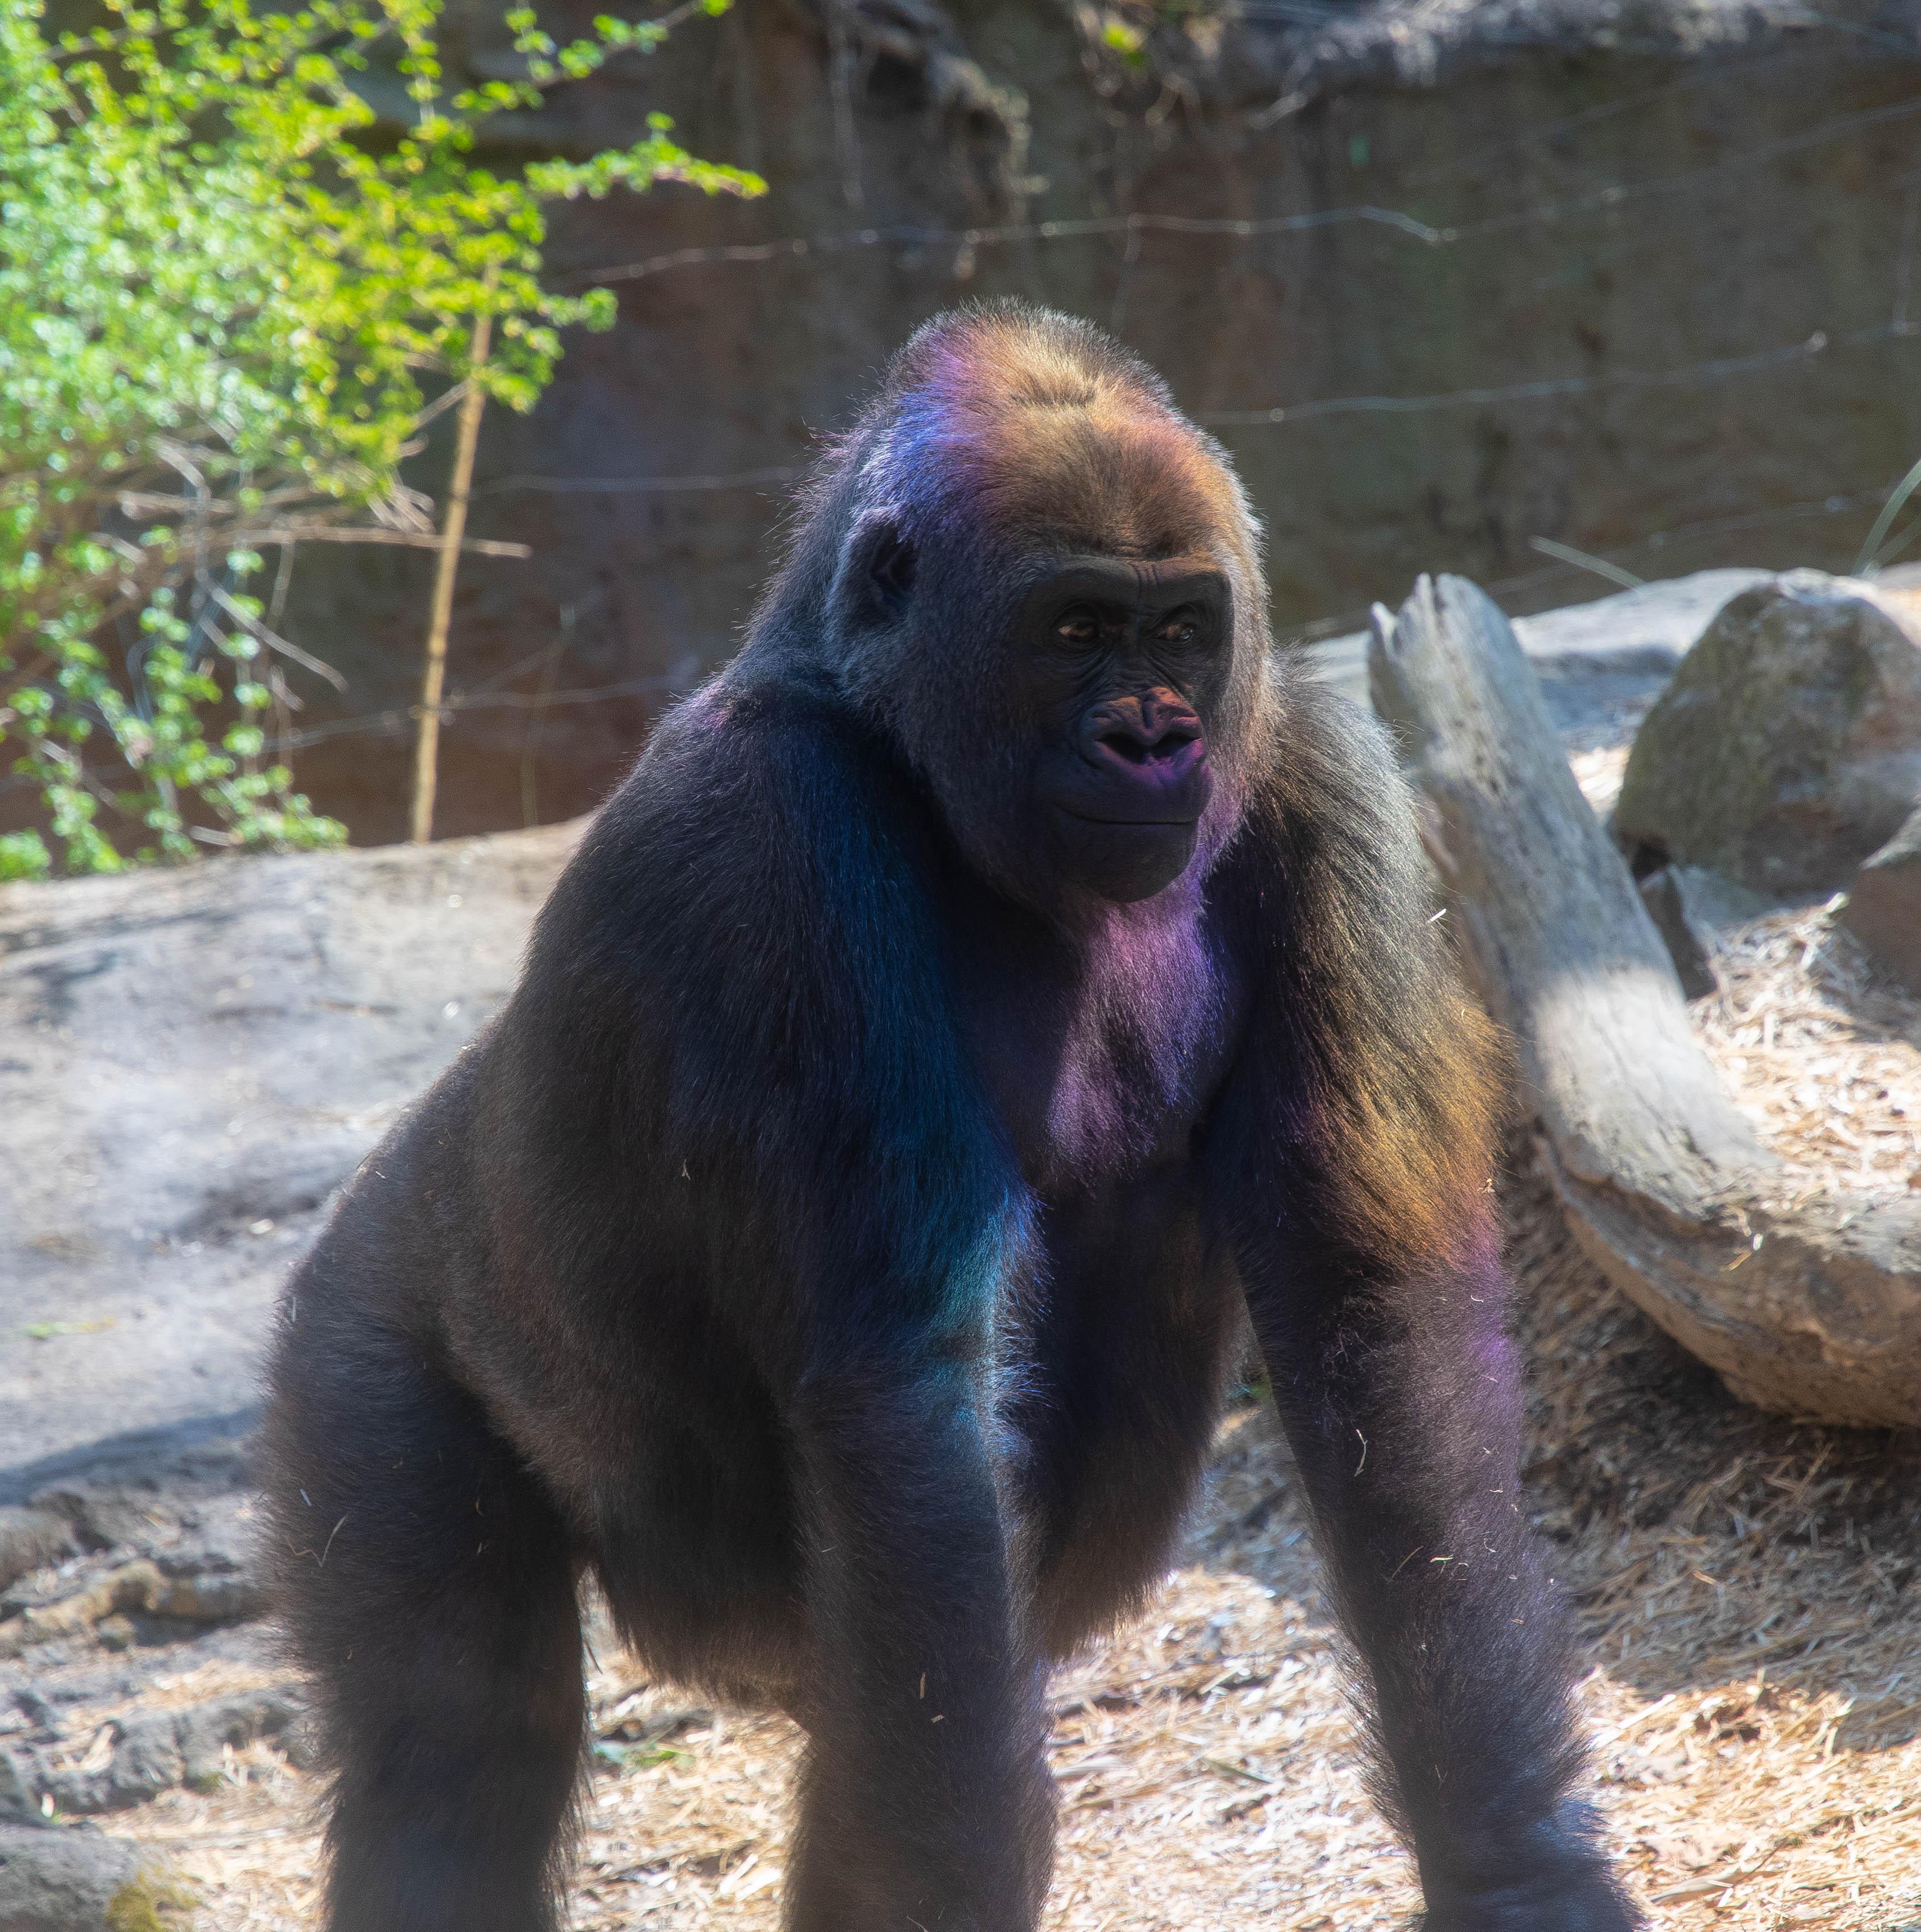 gorilla_rainbow_bronx_zoo-123028.jpg